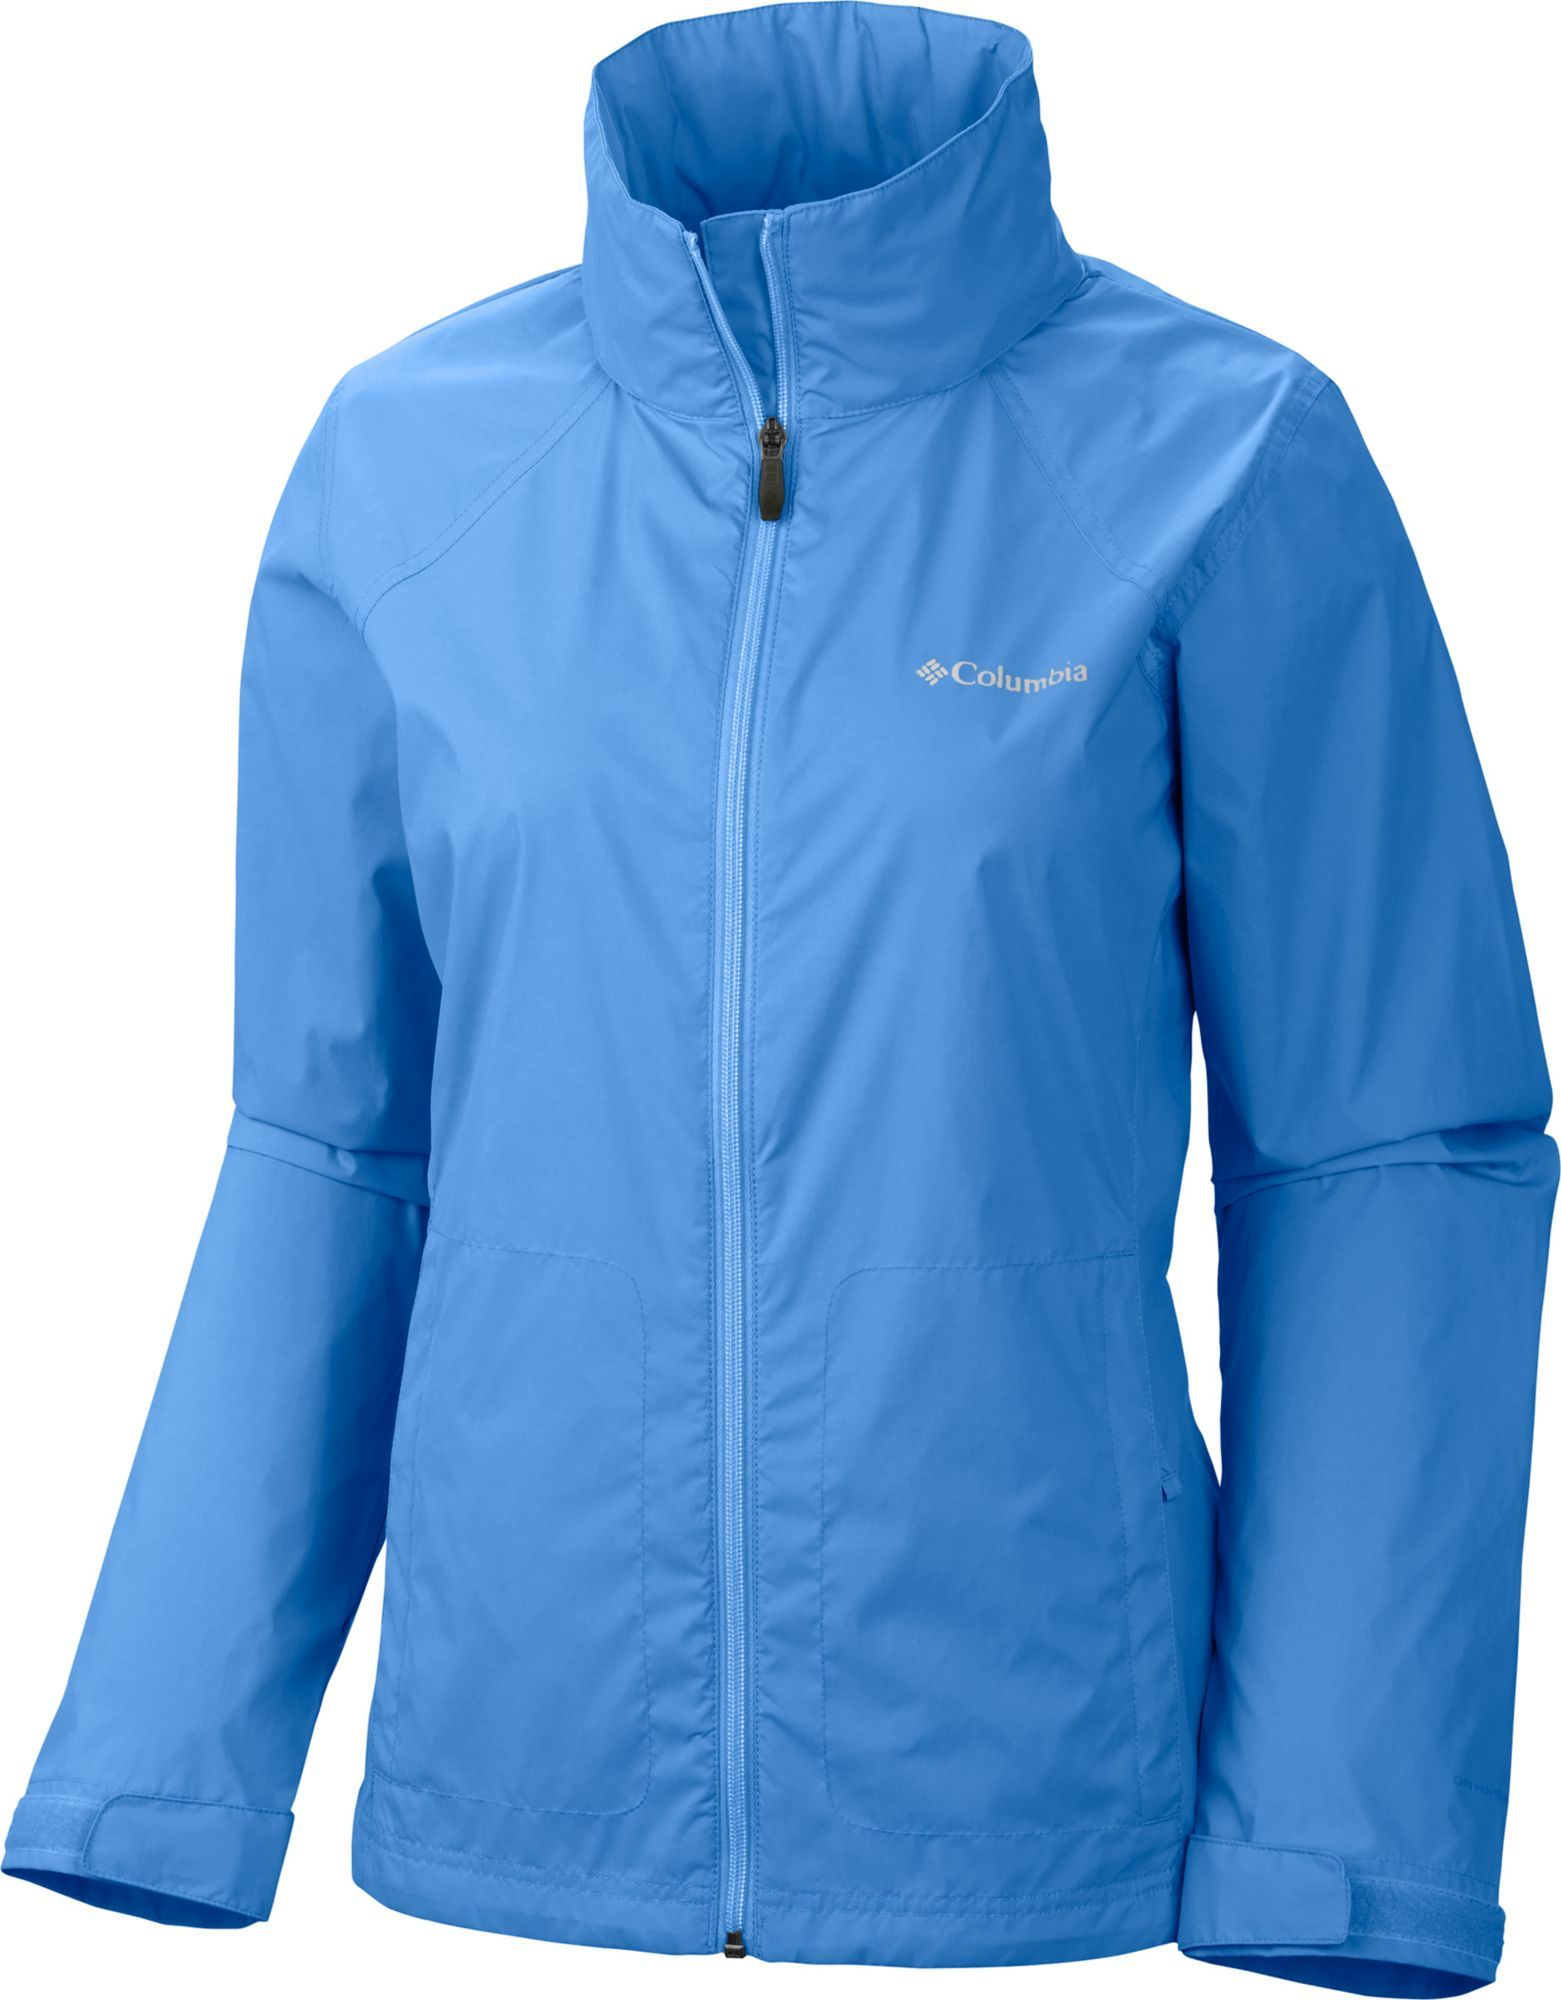 810bbe1c5d6eb Columbia Women s Switchback Rain Jacket